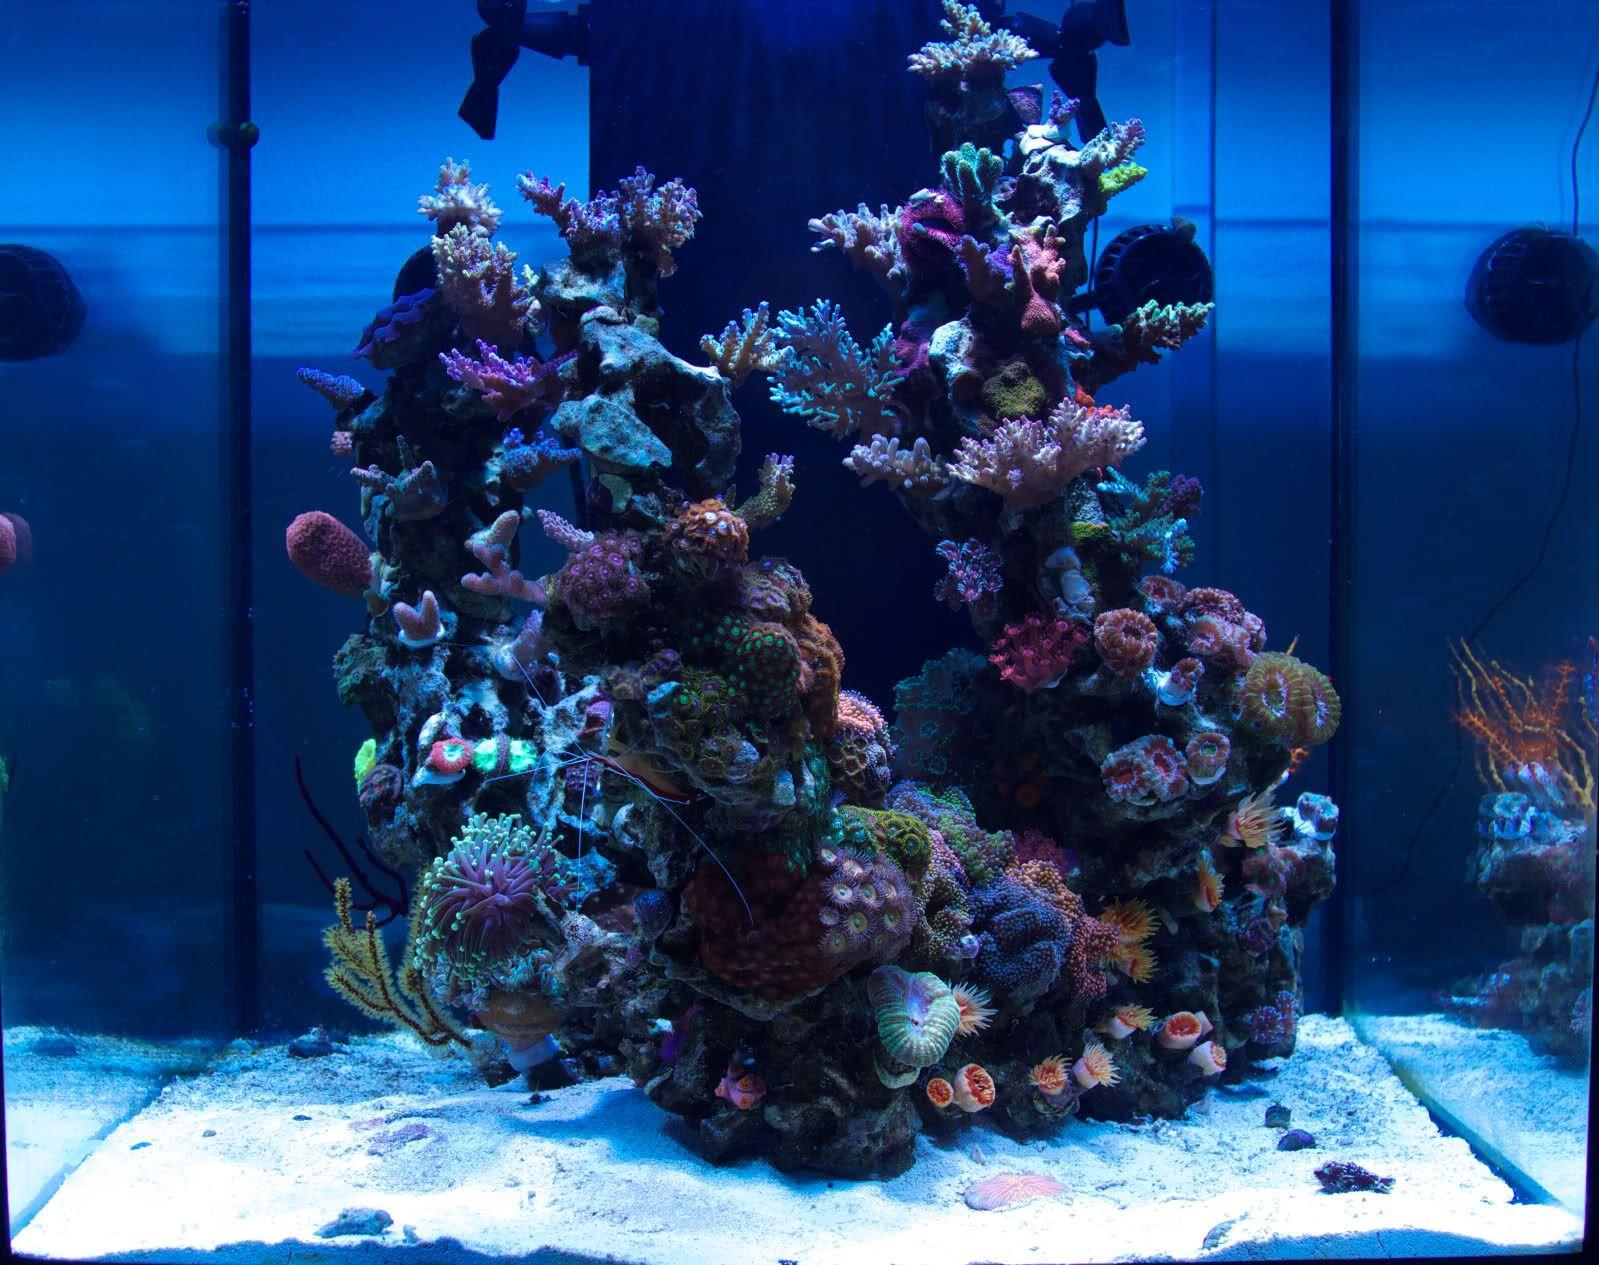 Medred 60g Nano Reef Saltwater Aquarium Saltwater Fish Tanks Coral Reef Aquarium